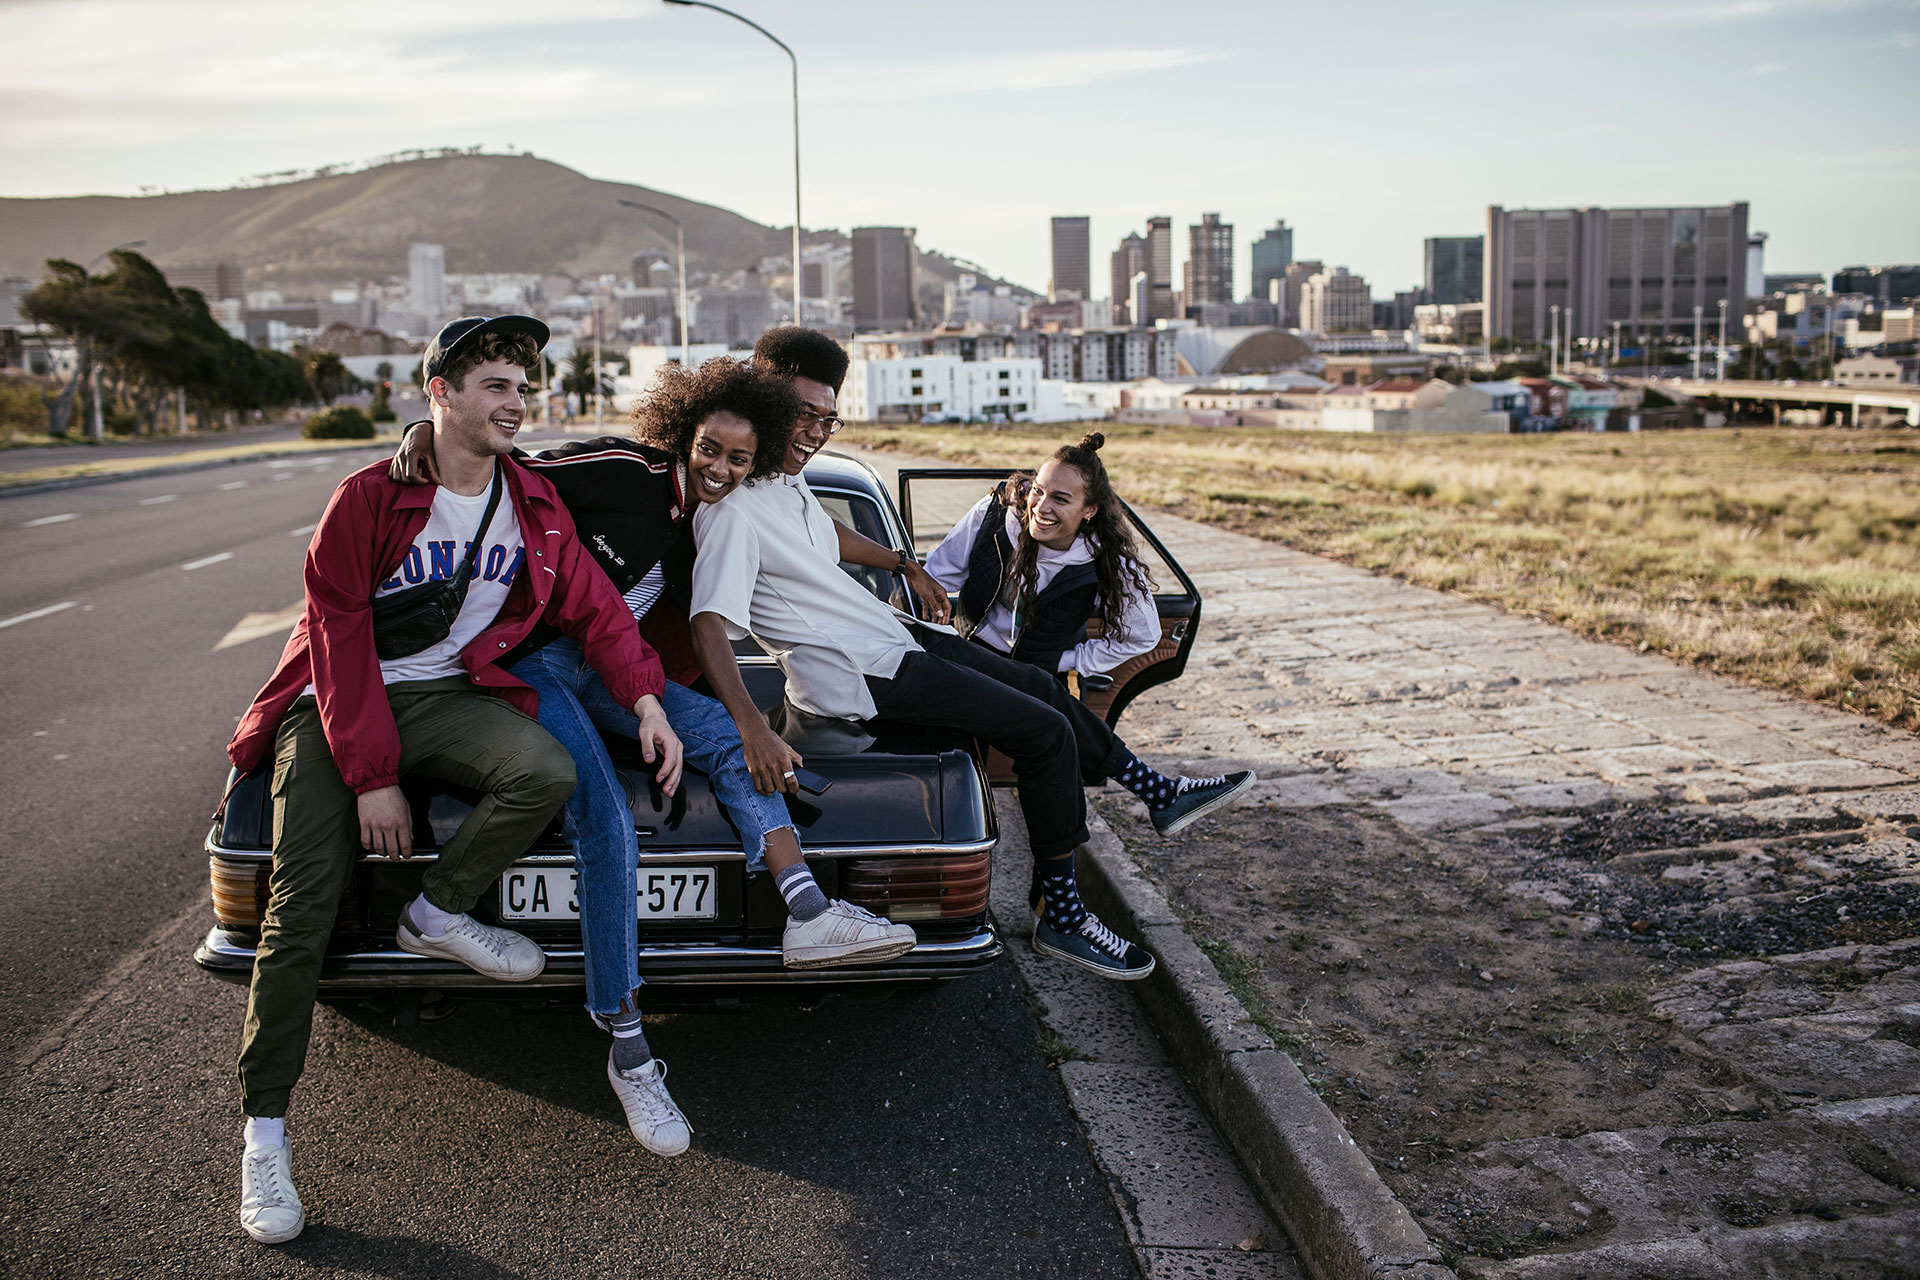 Kapstadt Südafrika Lifestyle People Outdoor Foto Kampagne Michael Müller